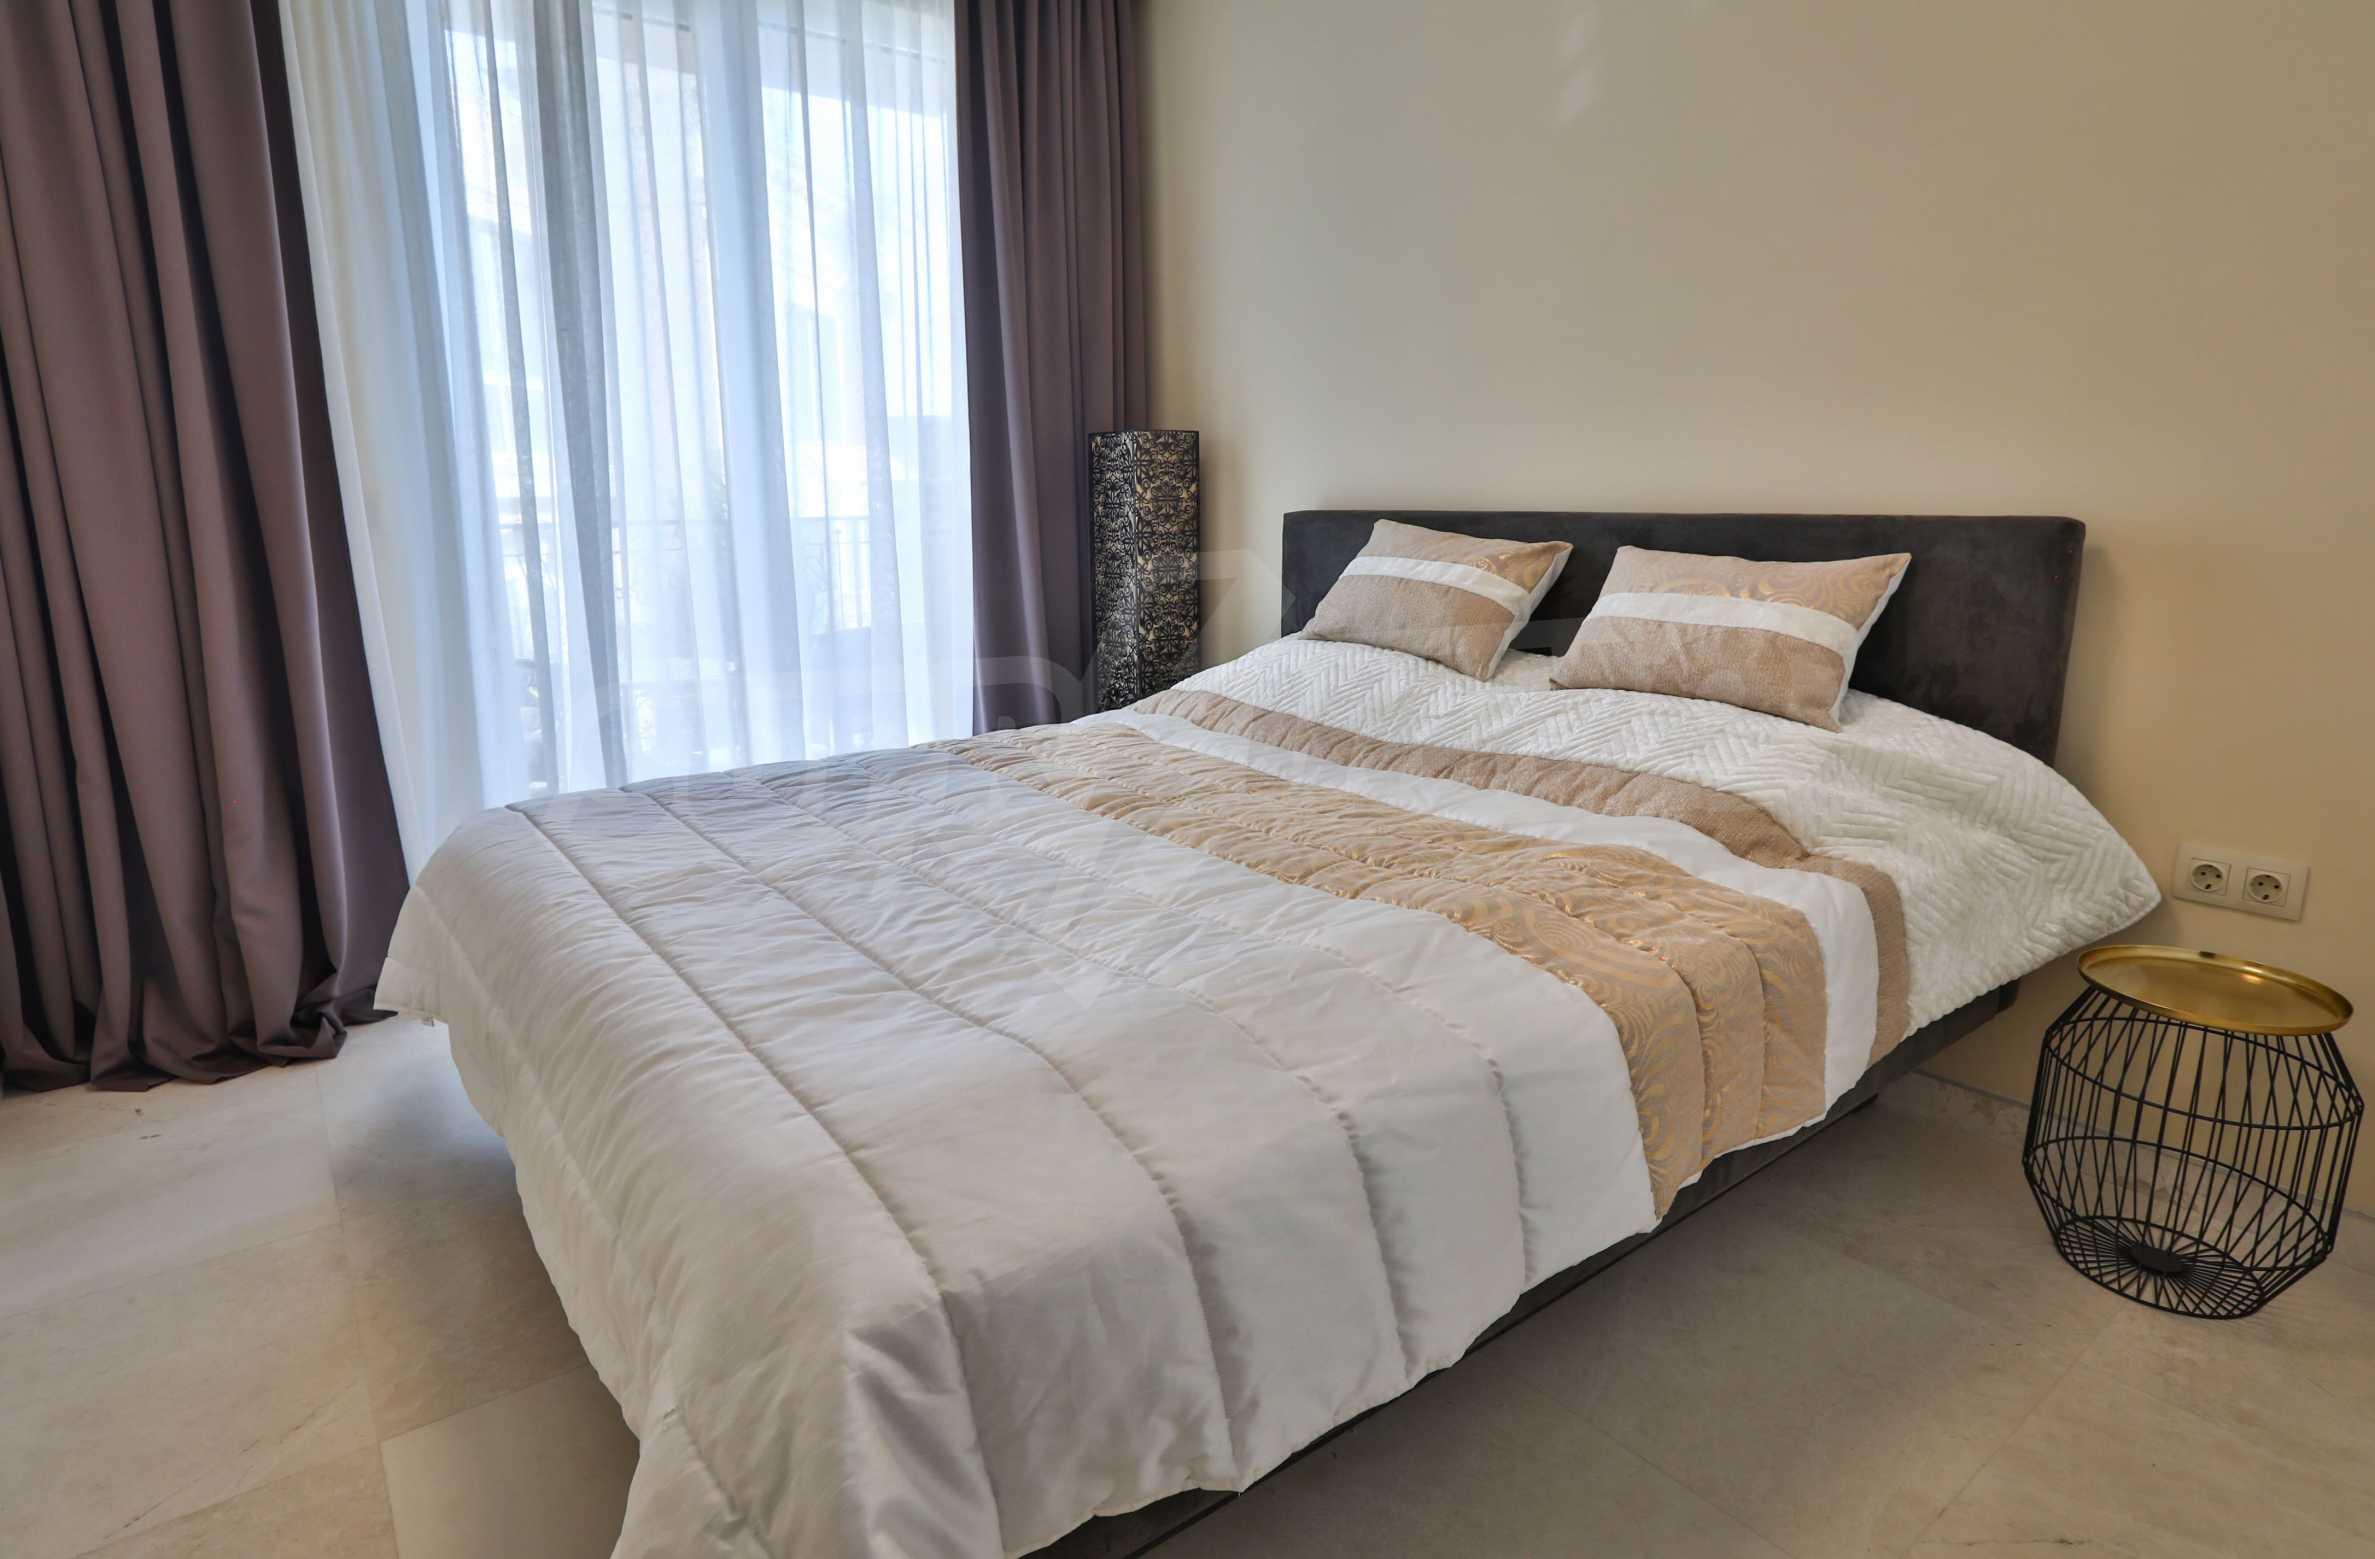 Дизайнерски тристаен апартамент под наем за летен сезон в резиденция Belle Époque в Лозенец 18